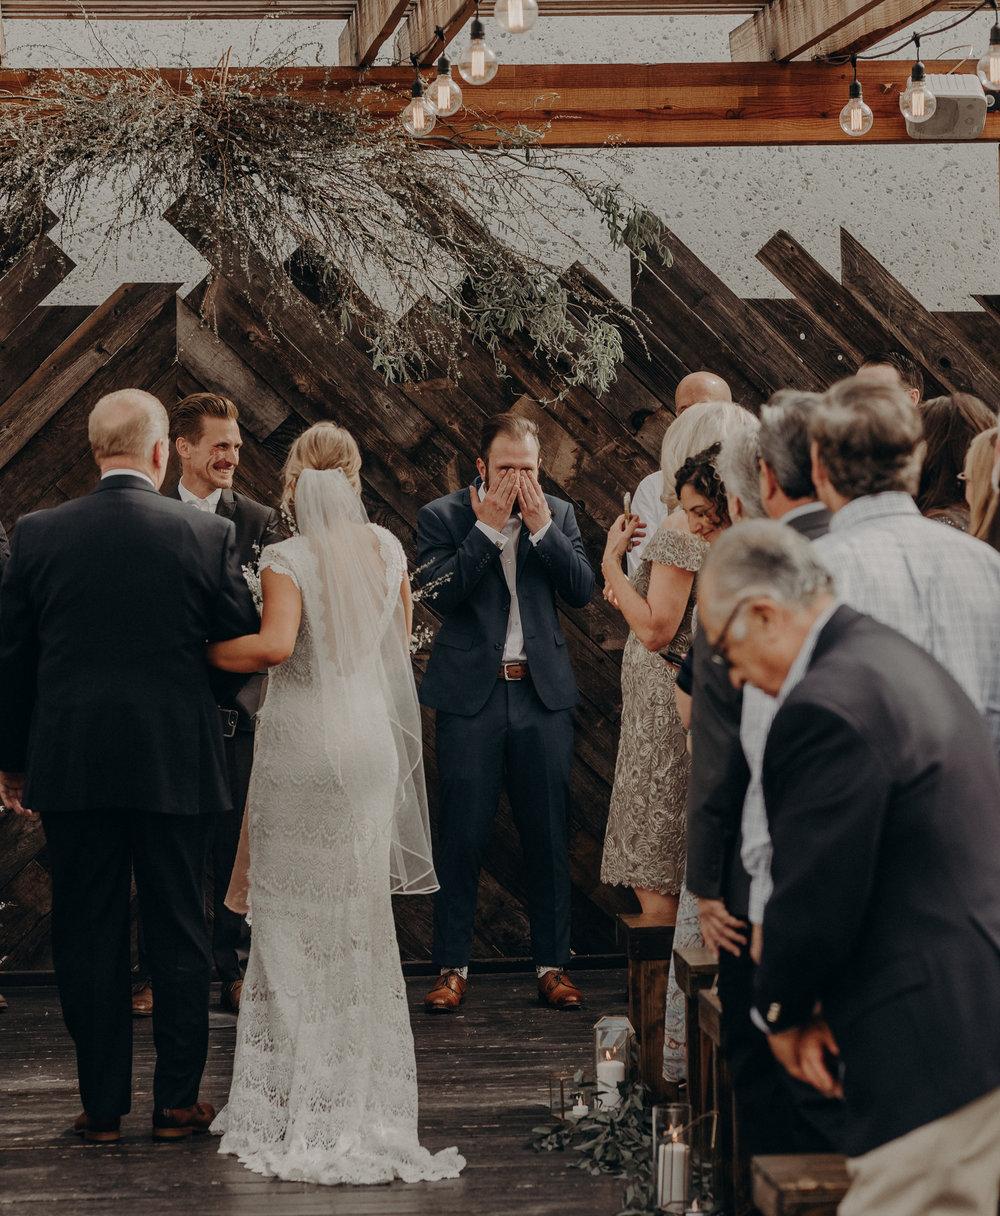 Los Angeles Wedding Photographers - The Woodshed Venue Wedding-051.jpg